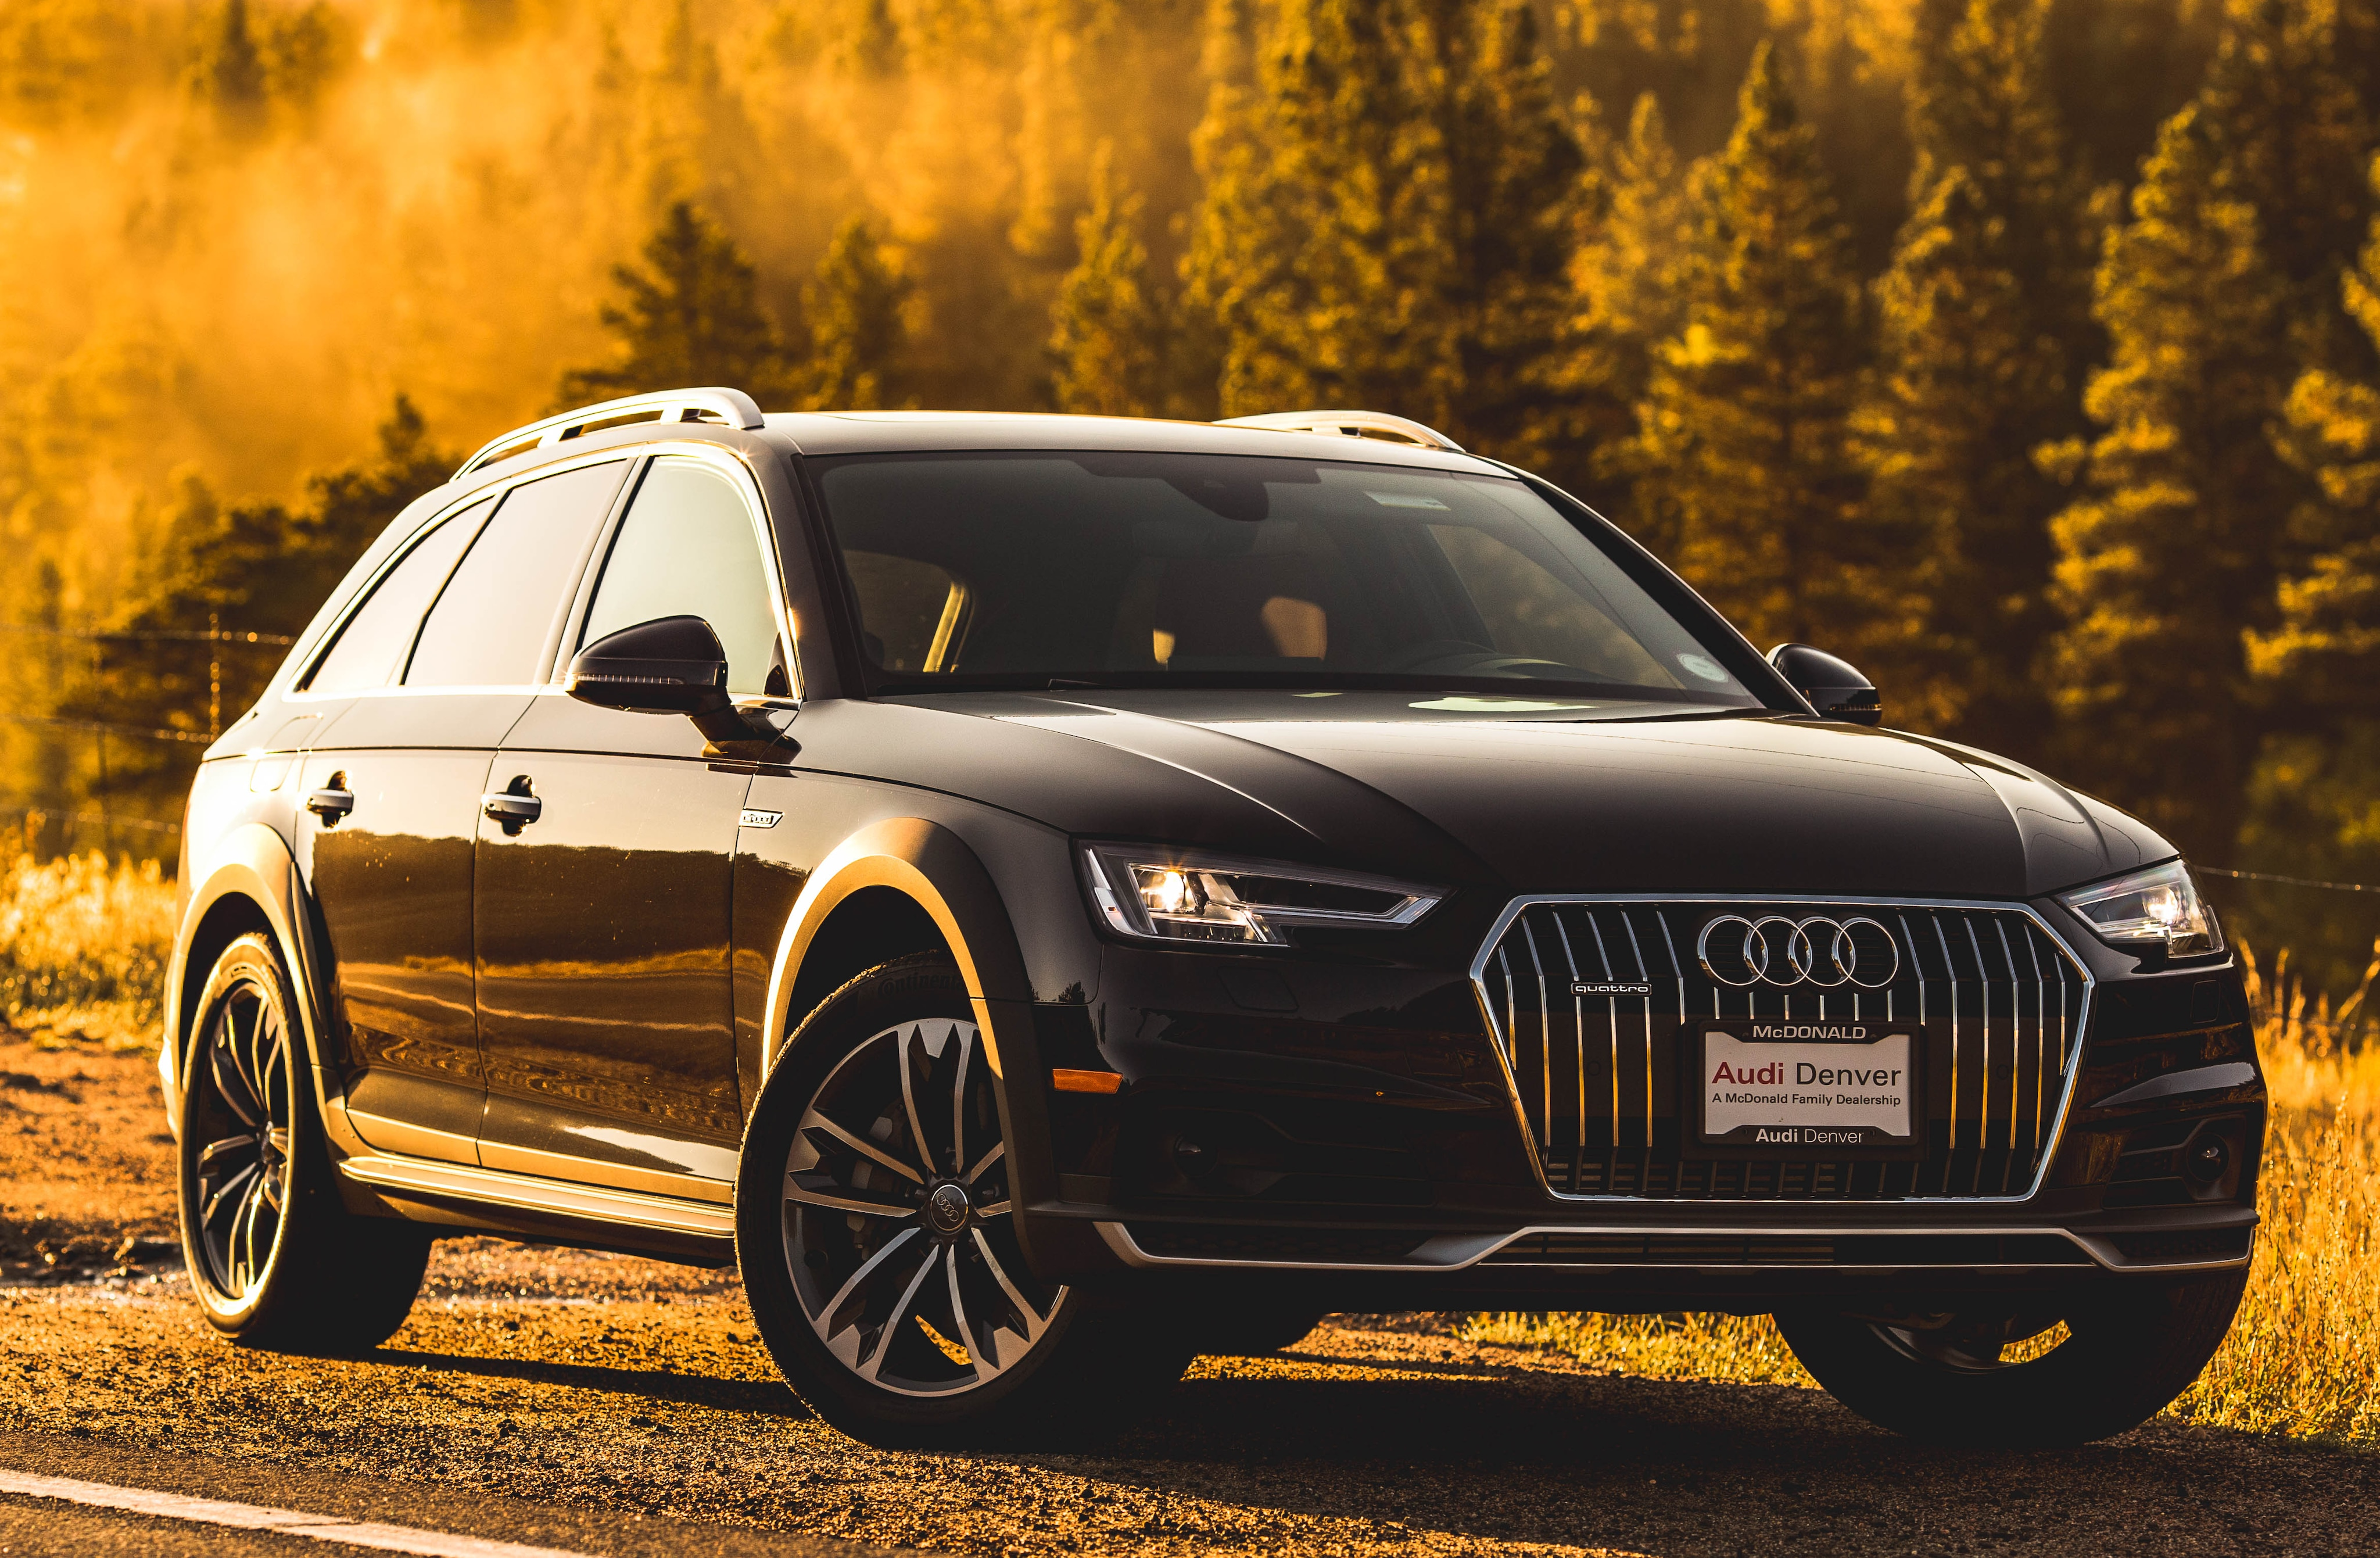 Audi Denver Whats New On The A Allroad - Mcdonald audi